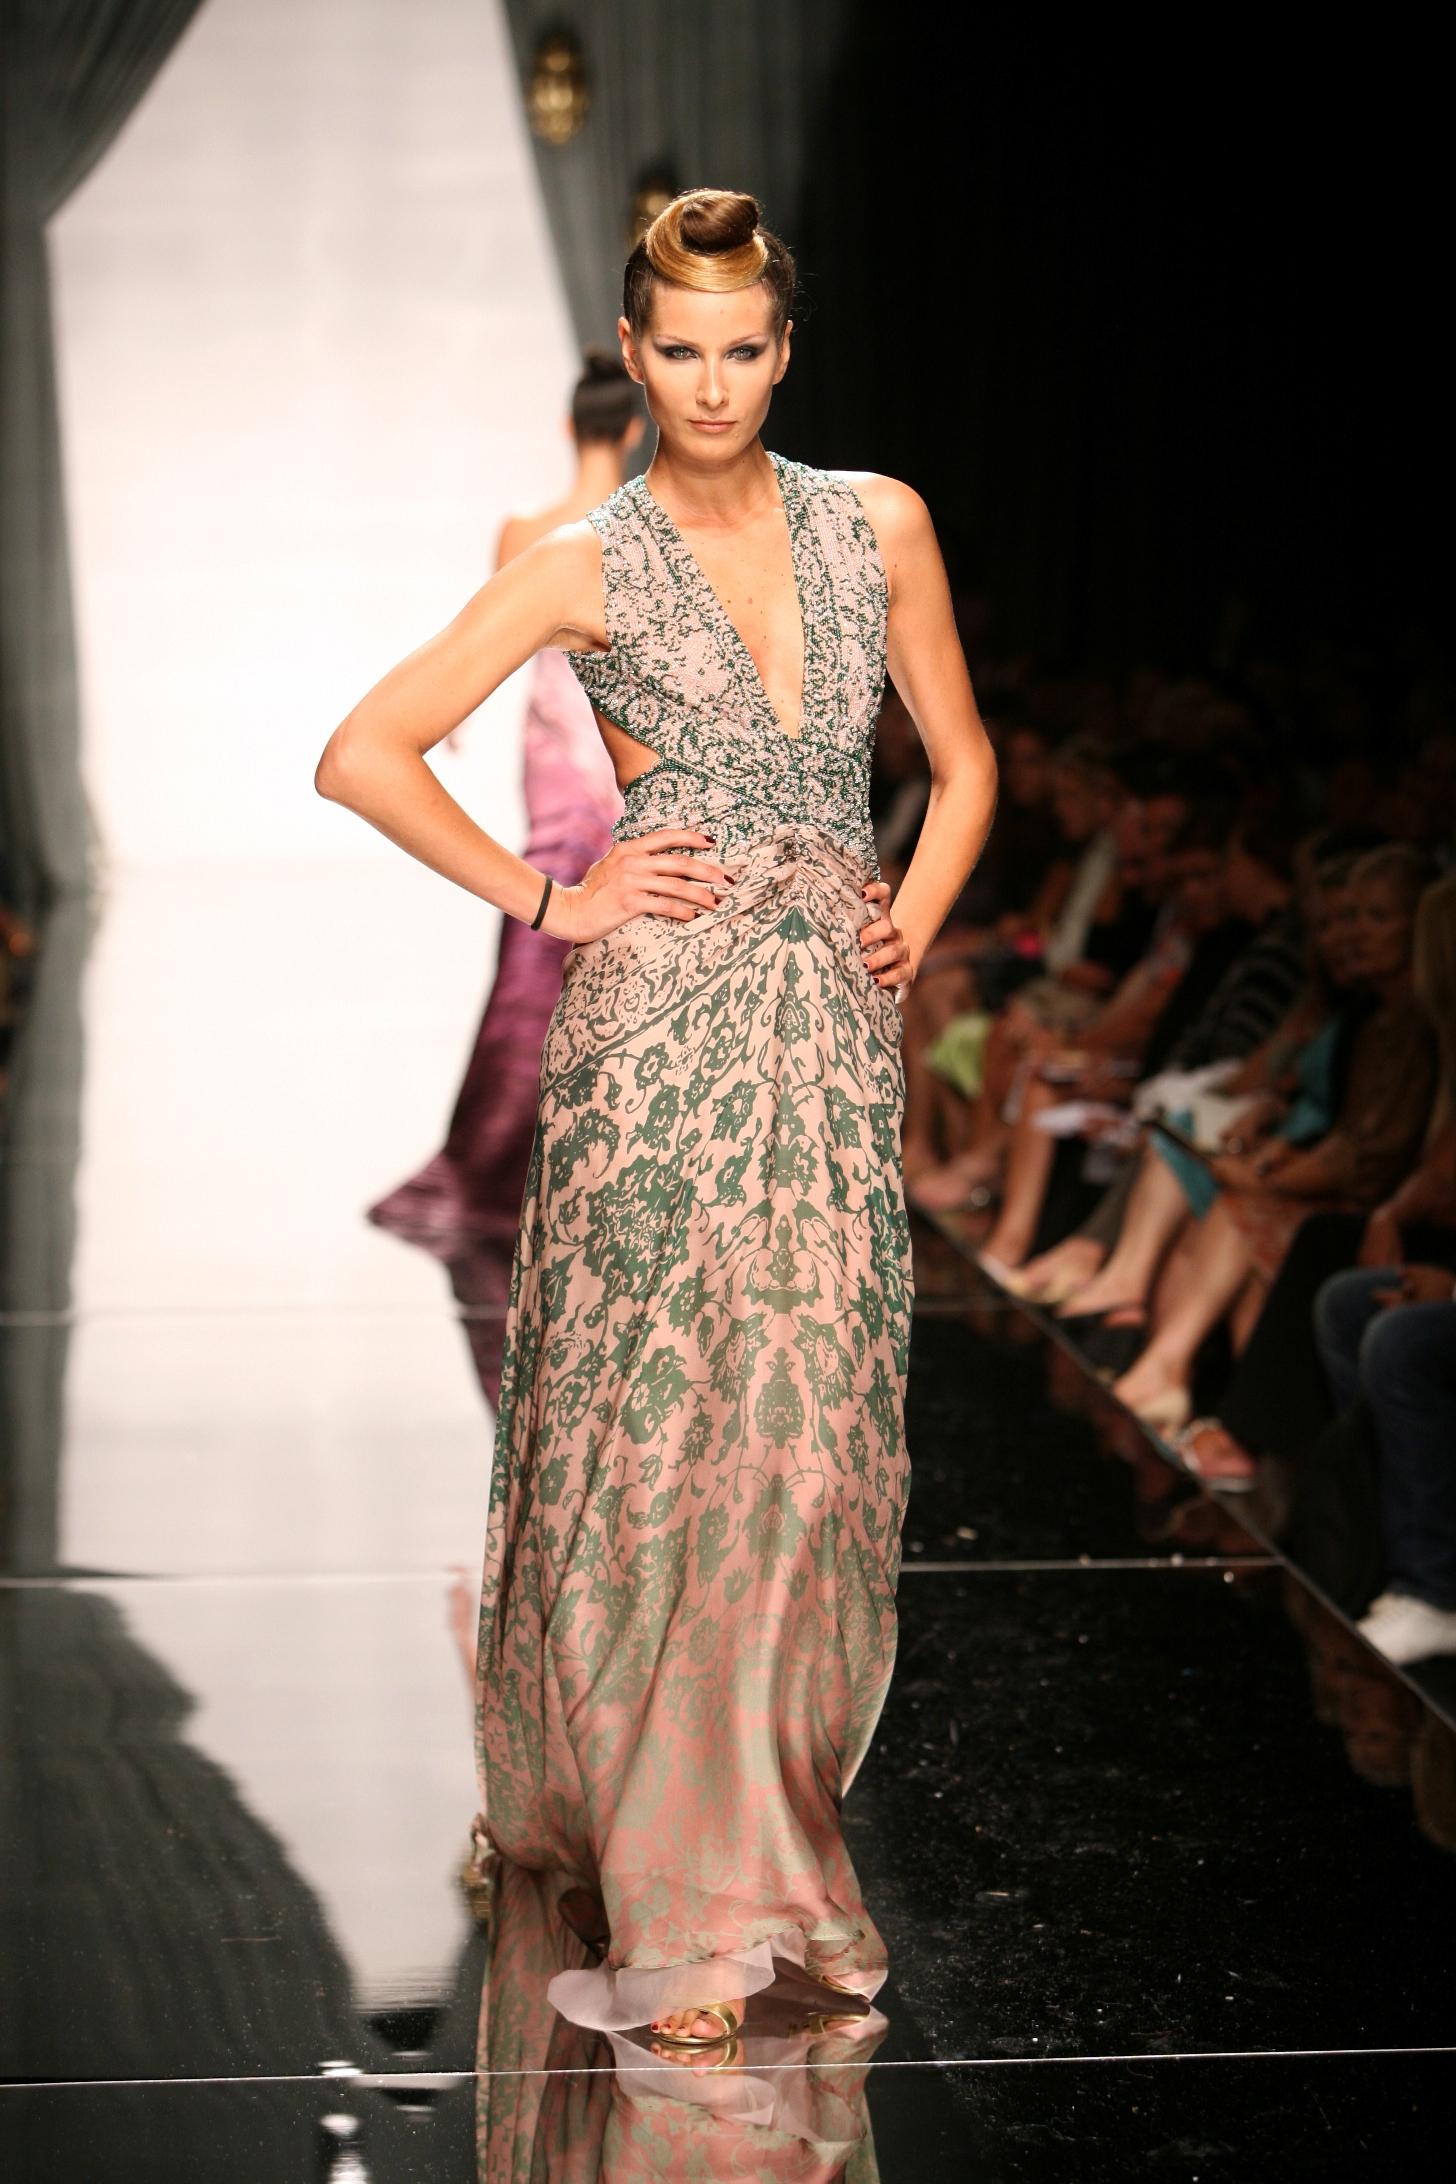 Persian Princess By Rami Al Ali 2011 | The FashionBrides